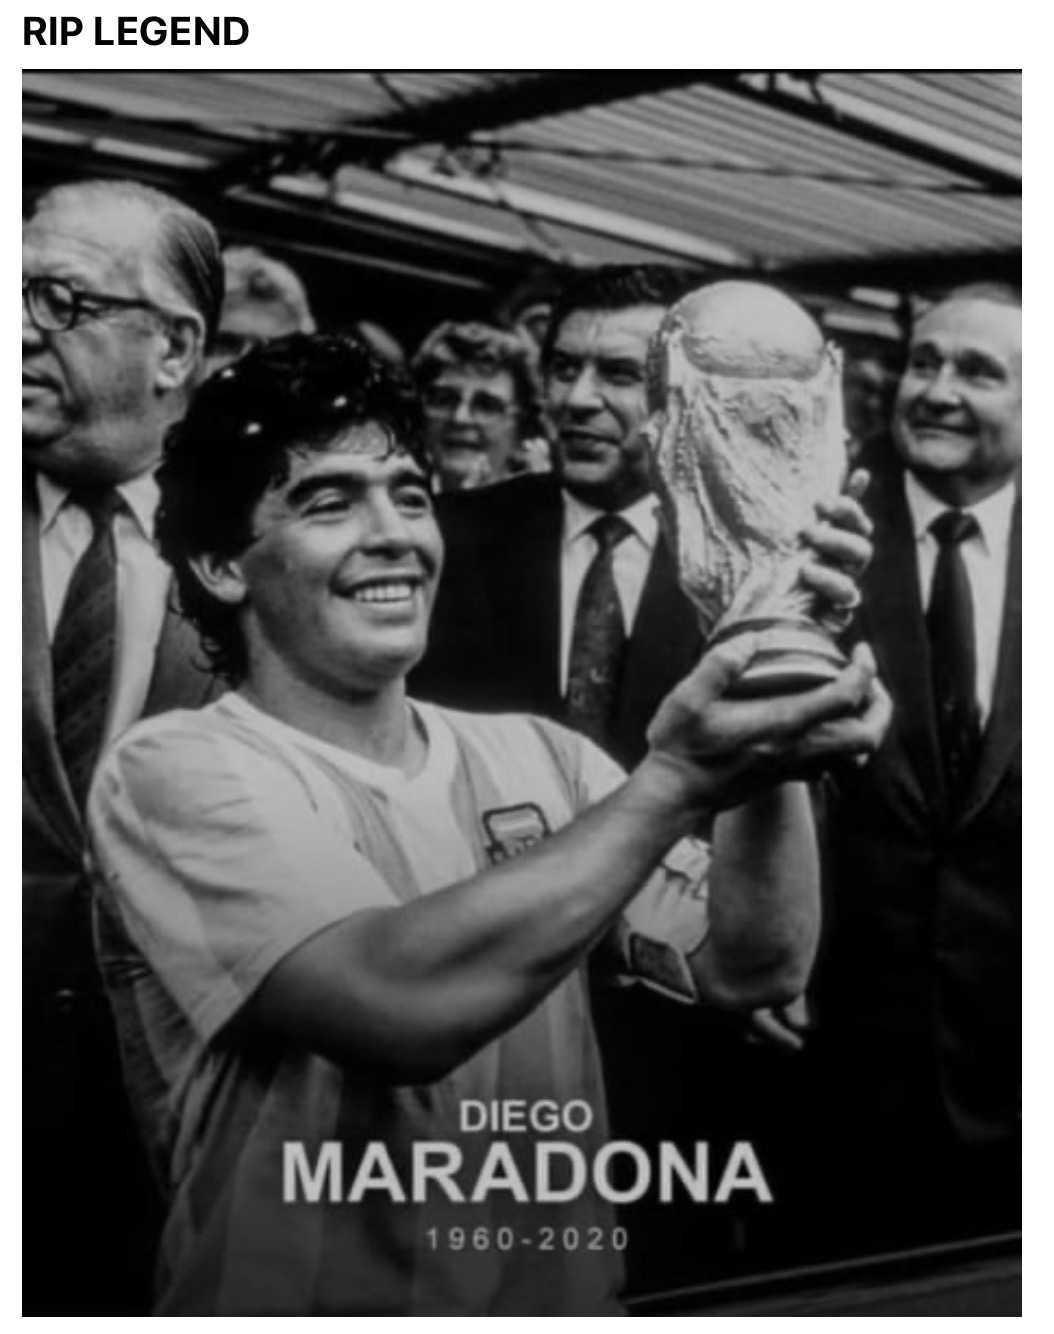 funny maradona meme tribute - champion